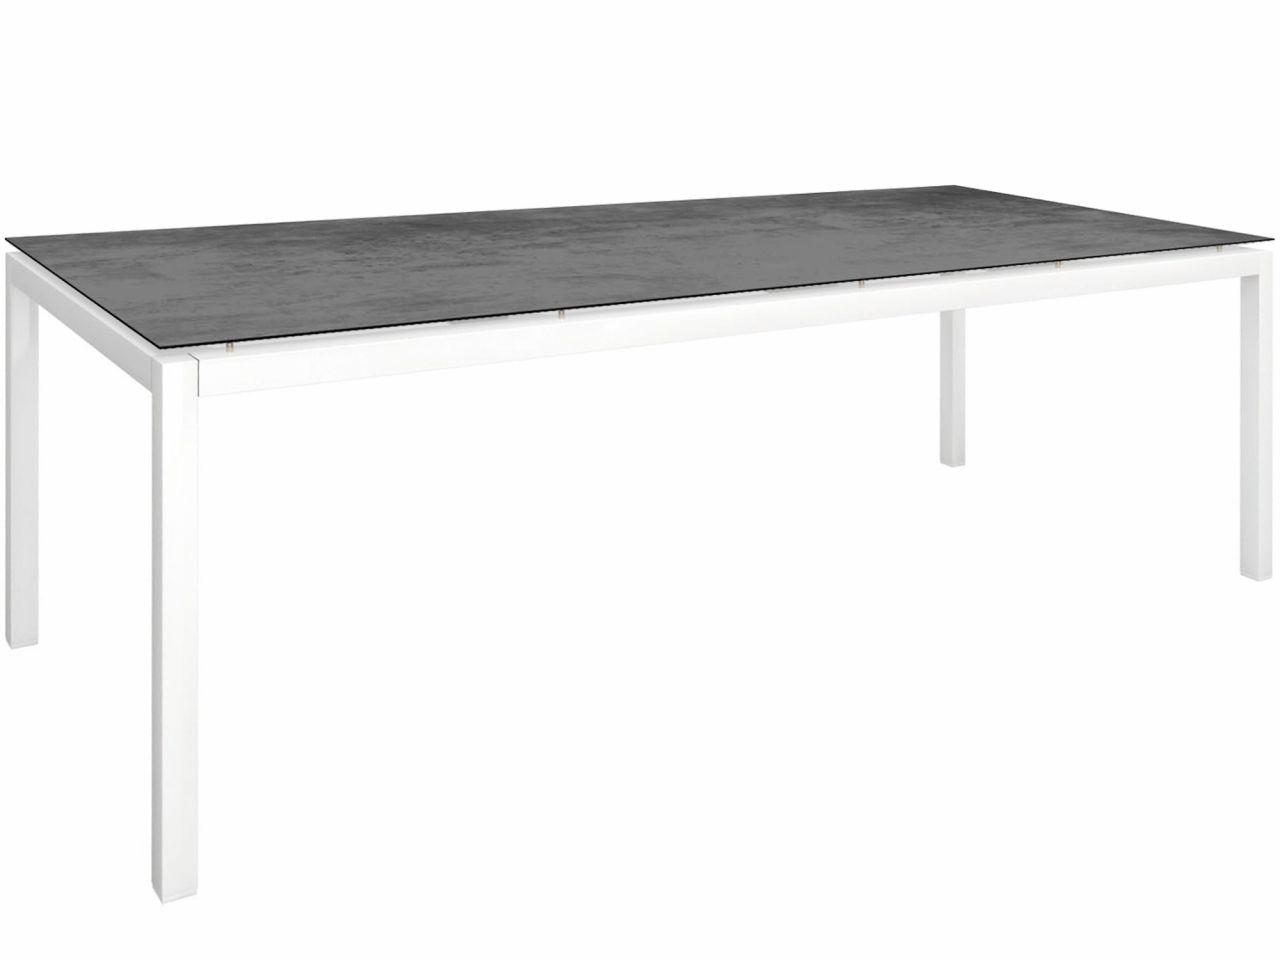 Stern Gartentisch 250x100cm Aluminium weiß/Silverstar 2.0 Zement